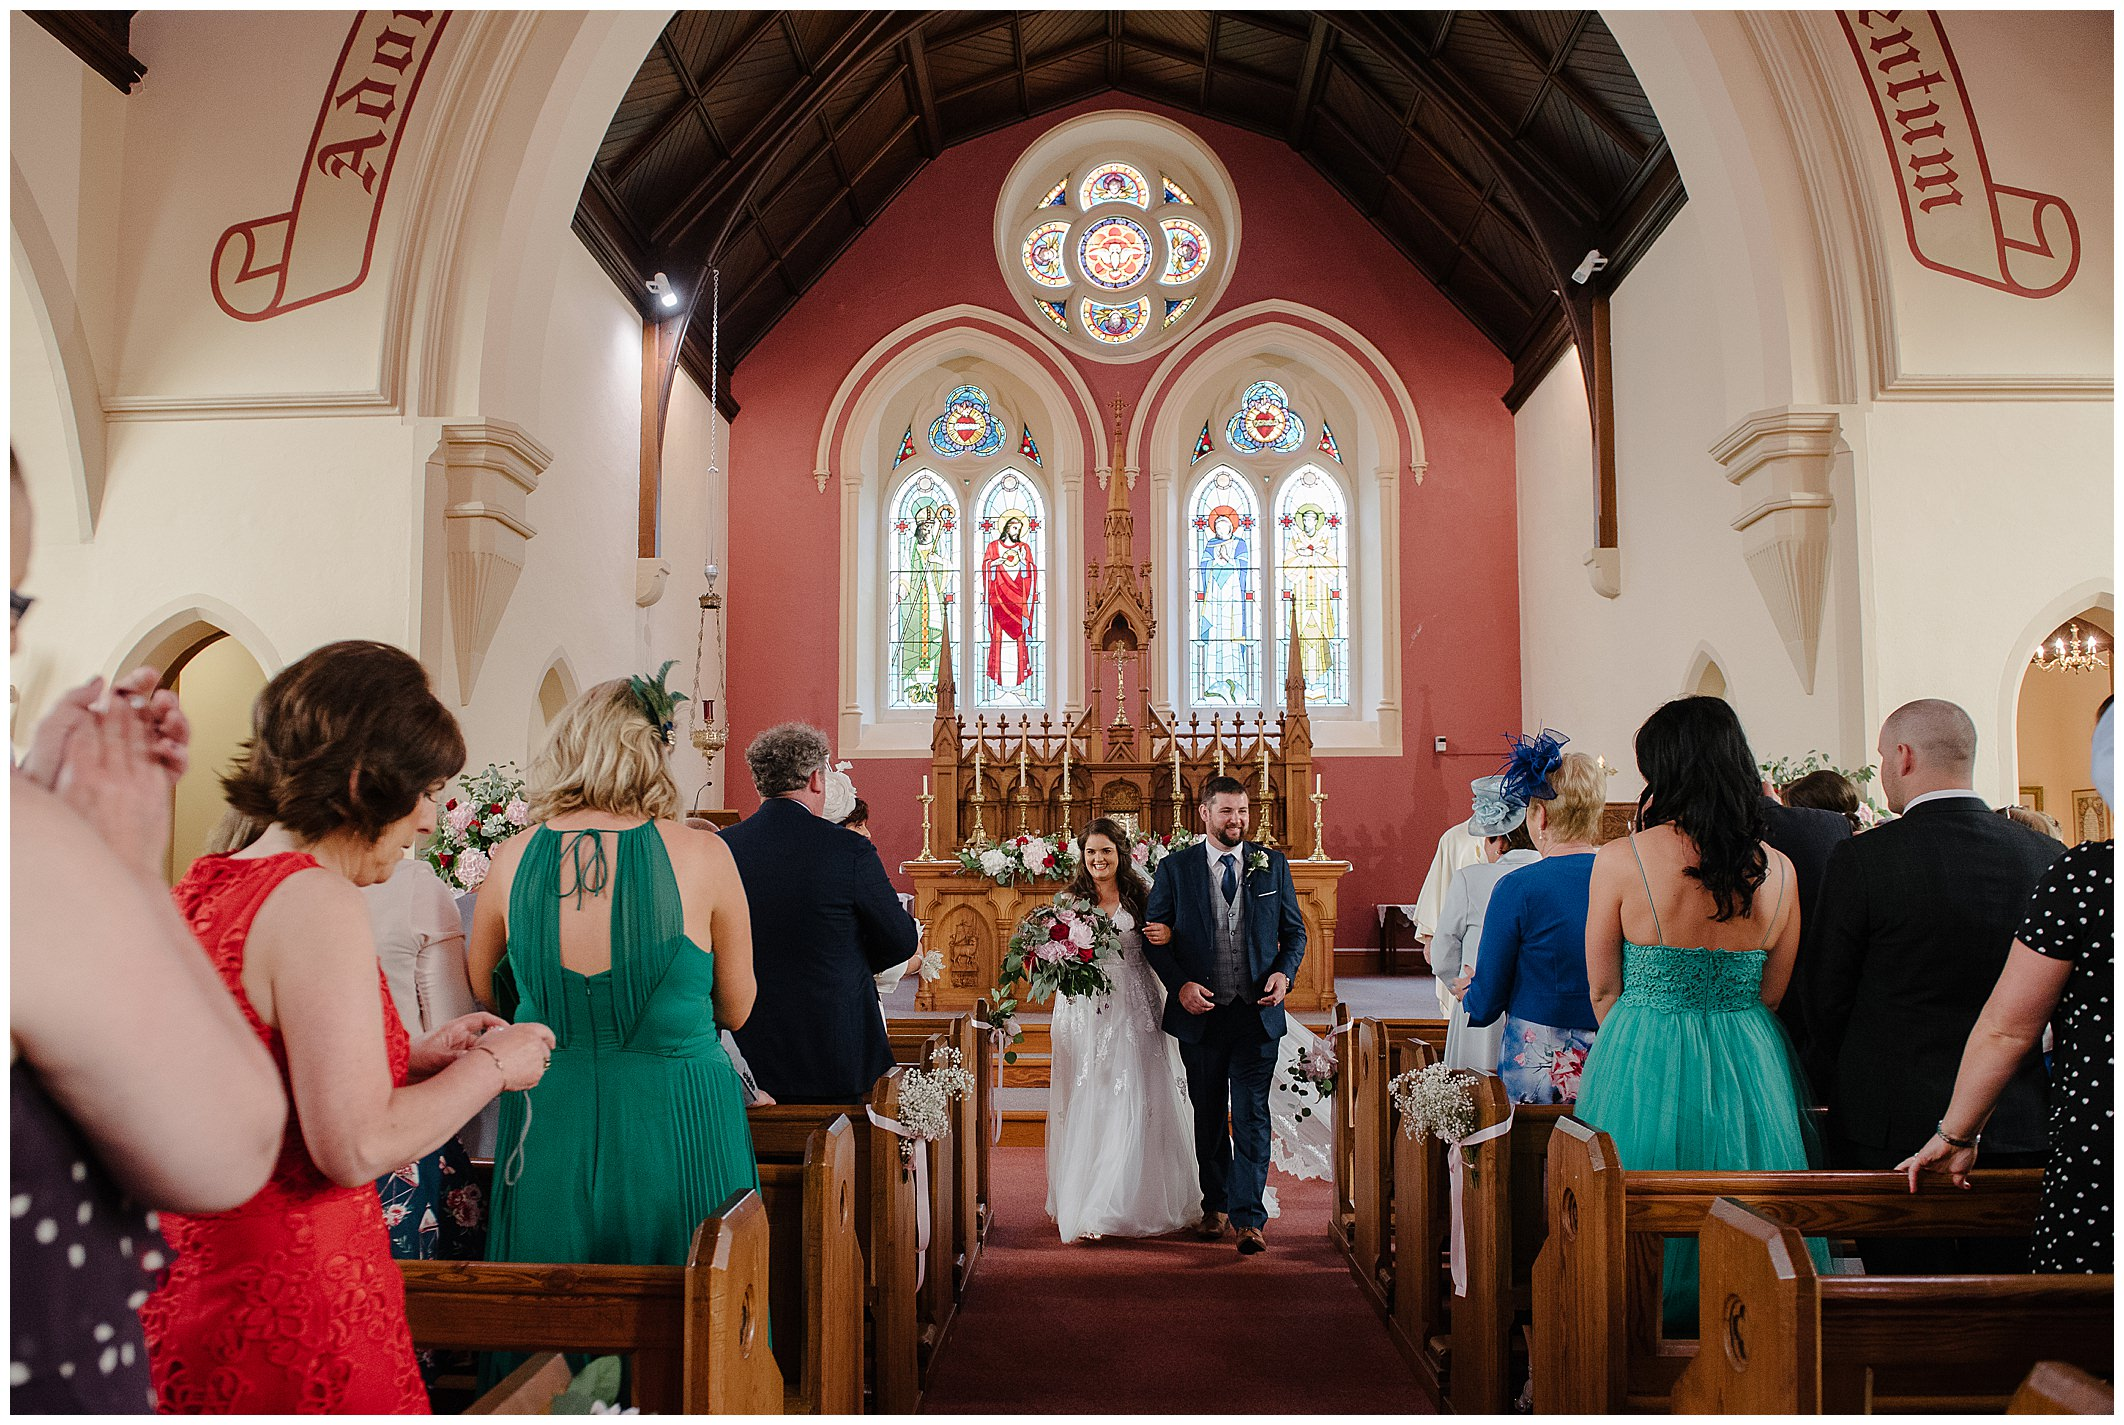 redcastle-hotel-wedding-karen-brian-jude-browne-photography-075.jpg